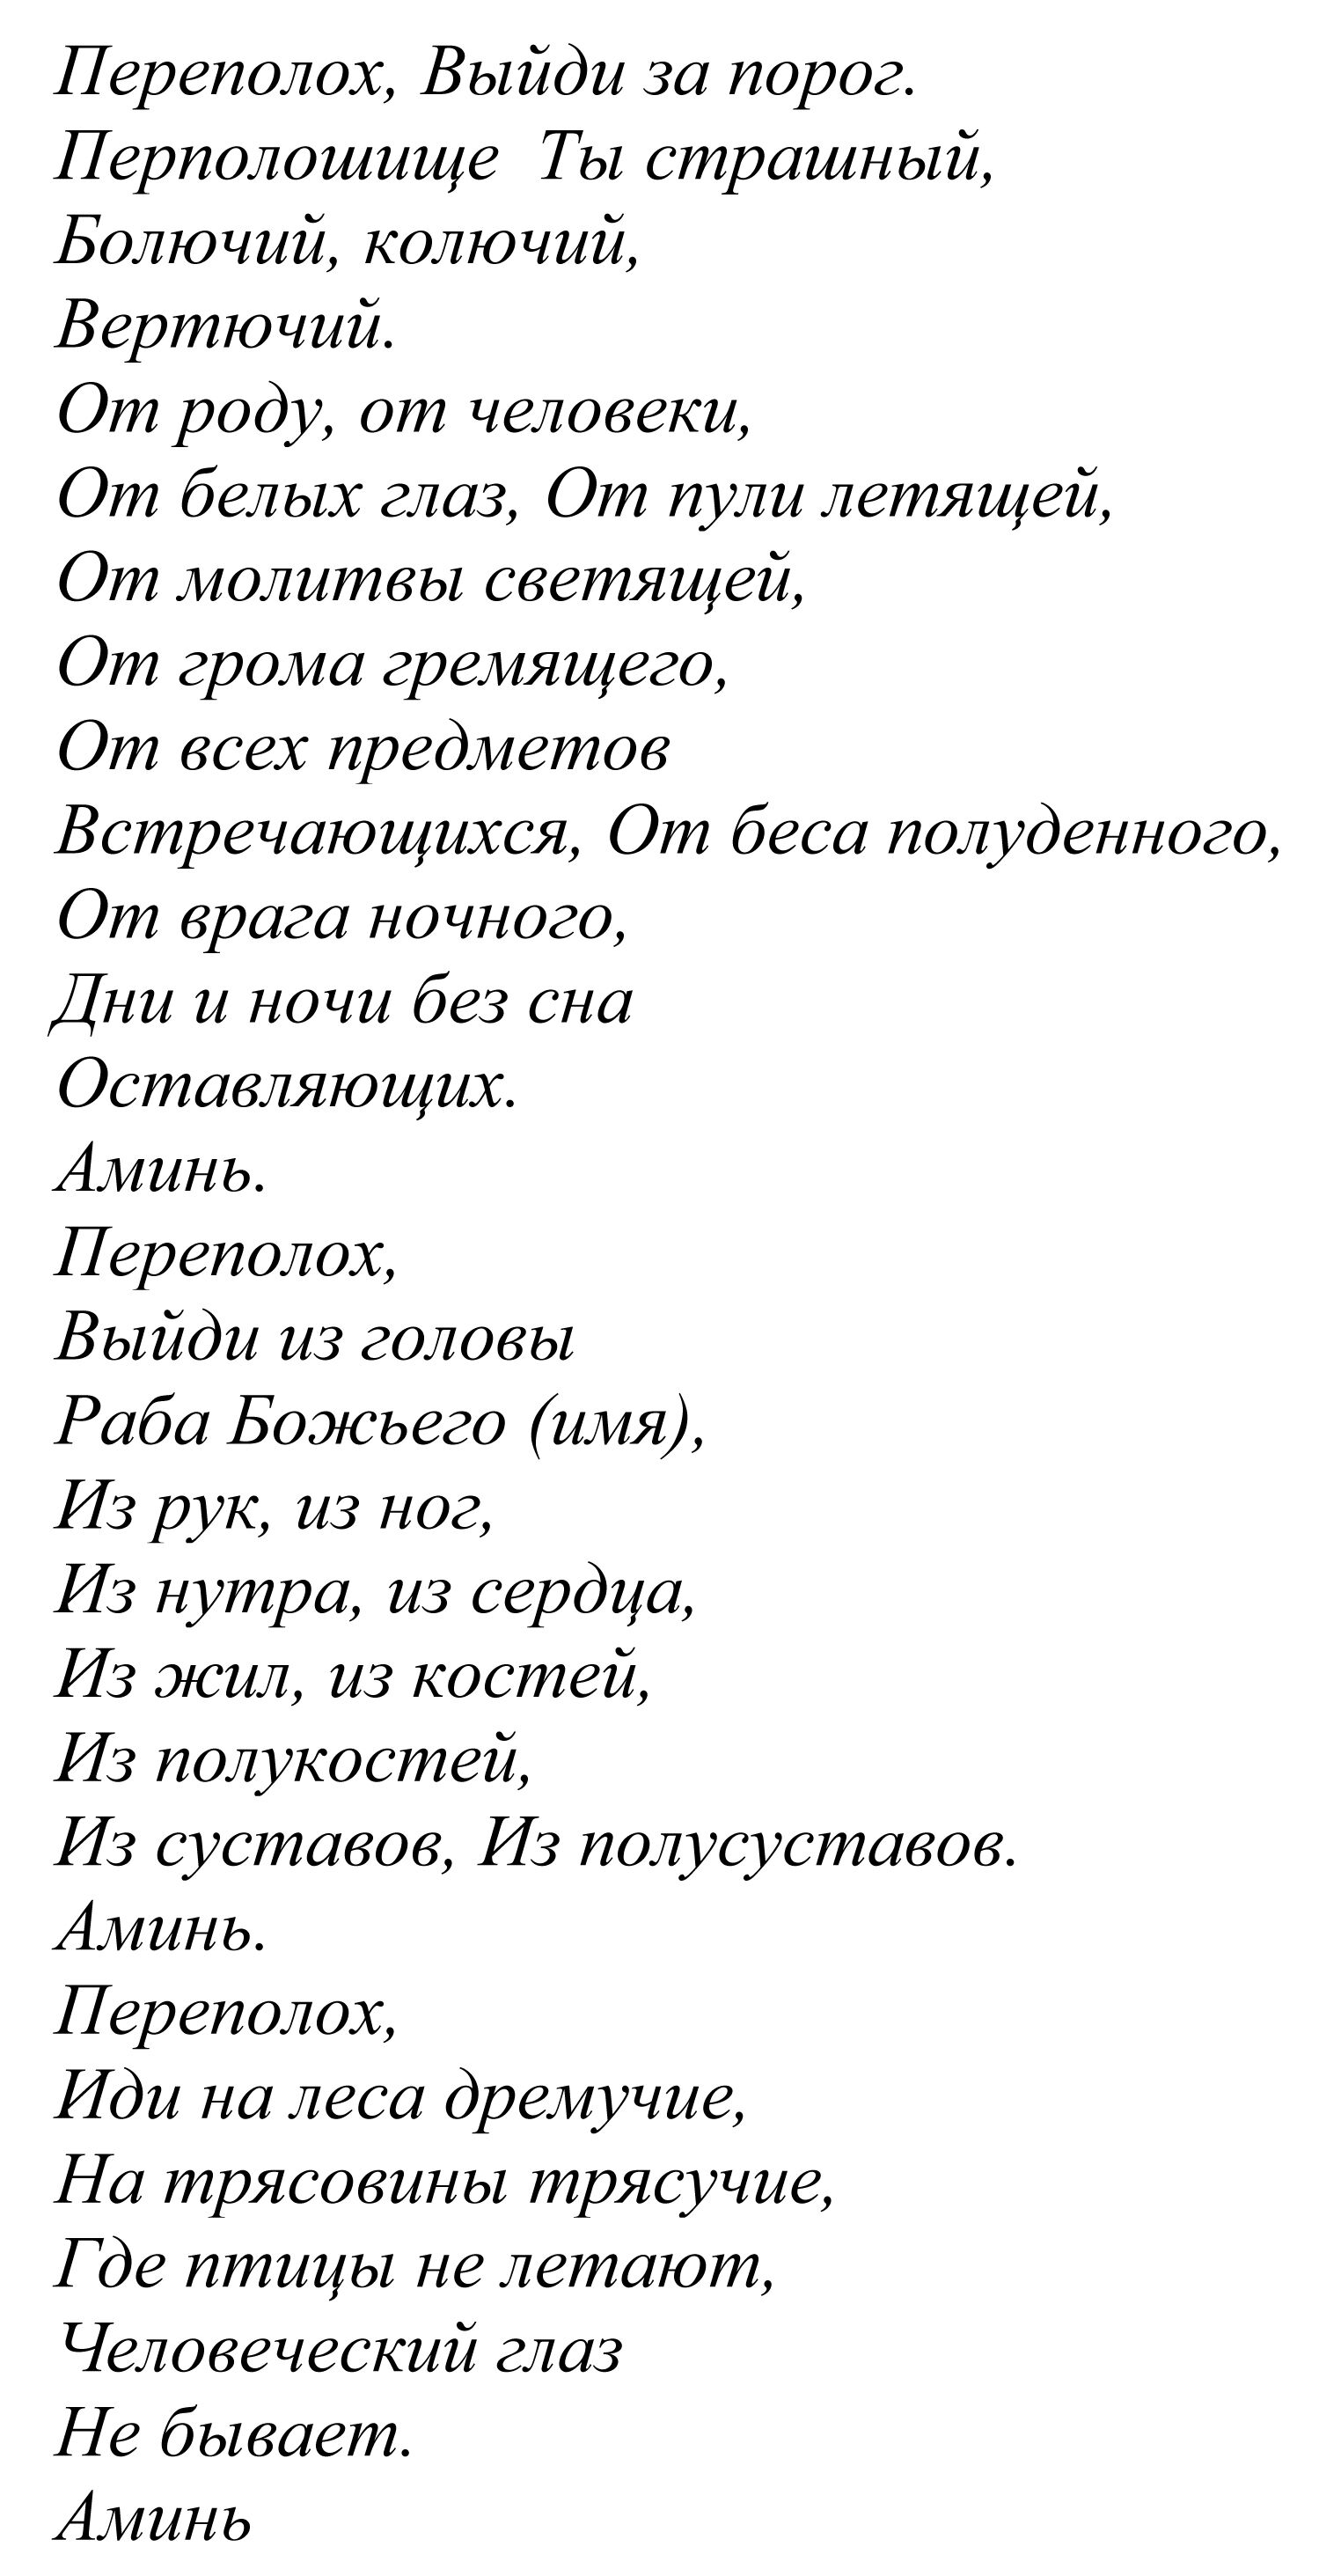 Pesnia